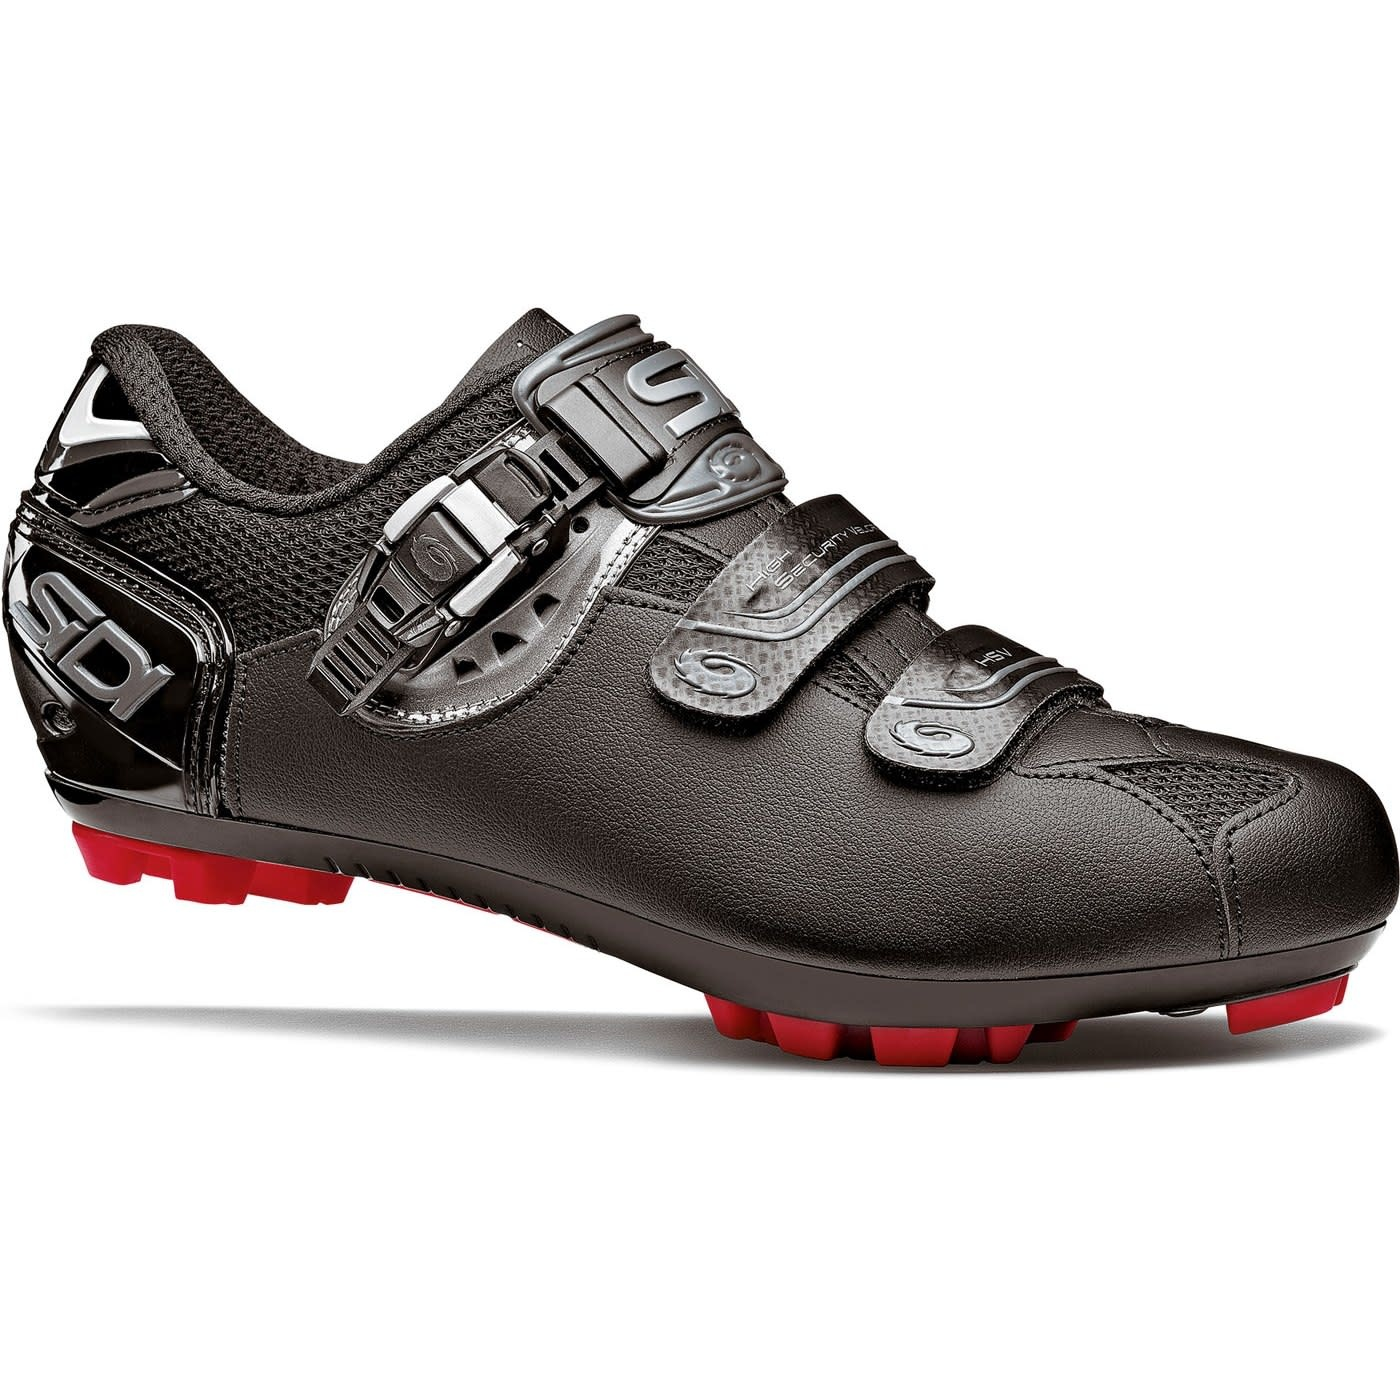 Sidi Sidi Eagle 7 MTB Shoe Shadow Black Mega 43